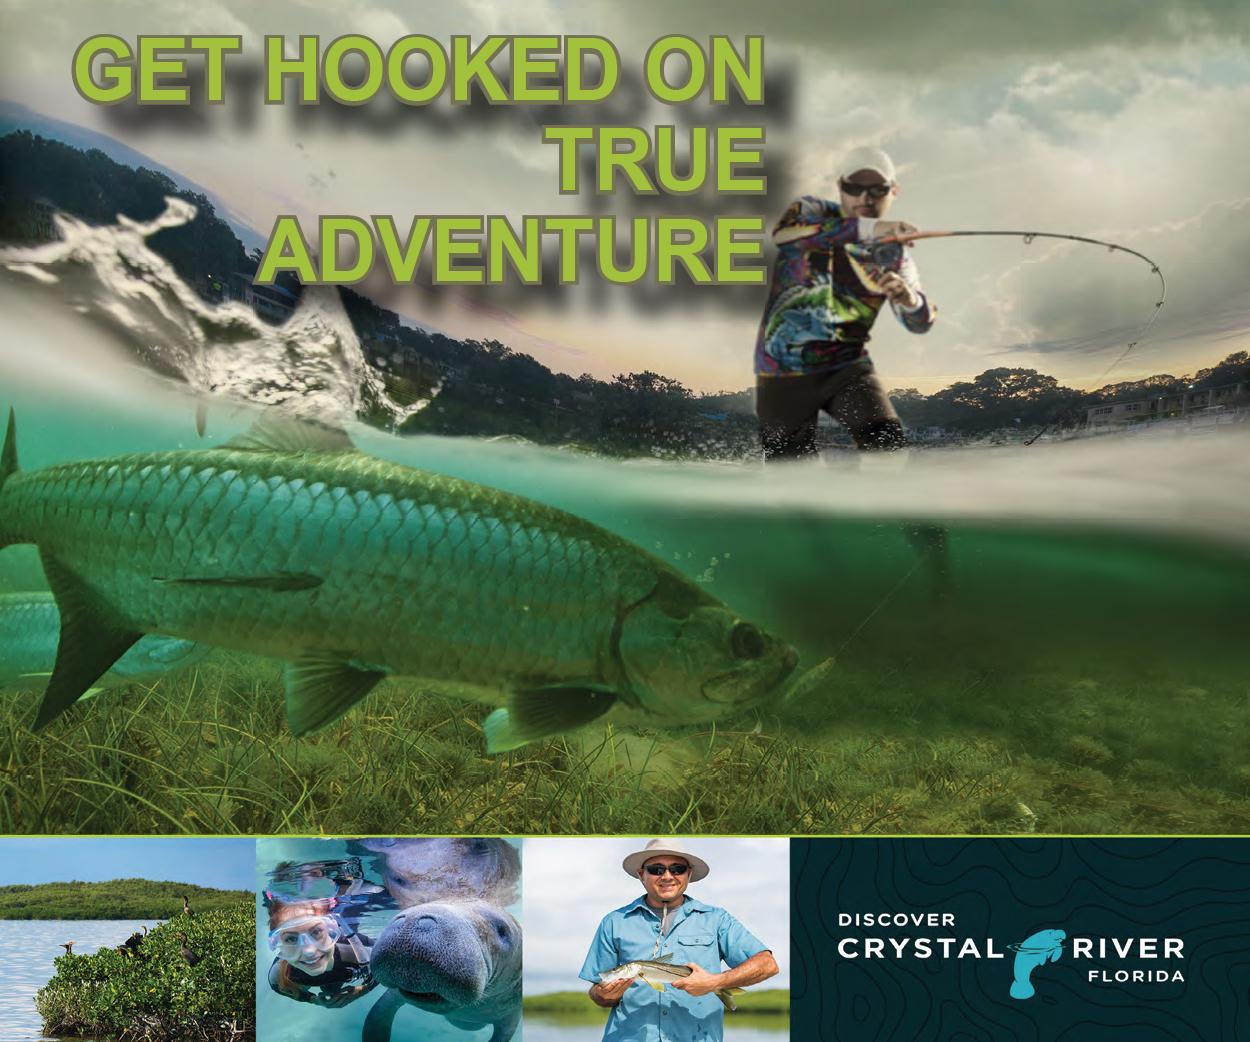 crysta river orange county web ad.jpg